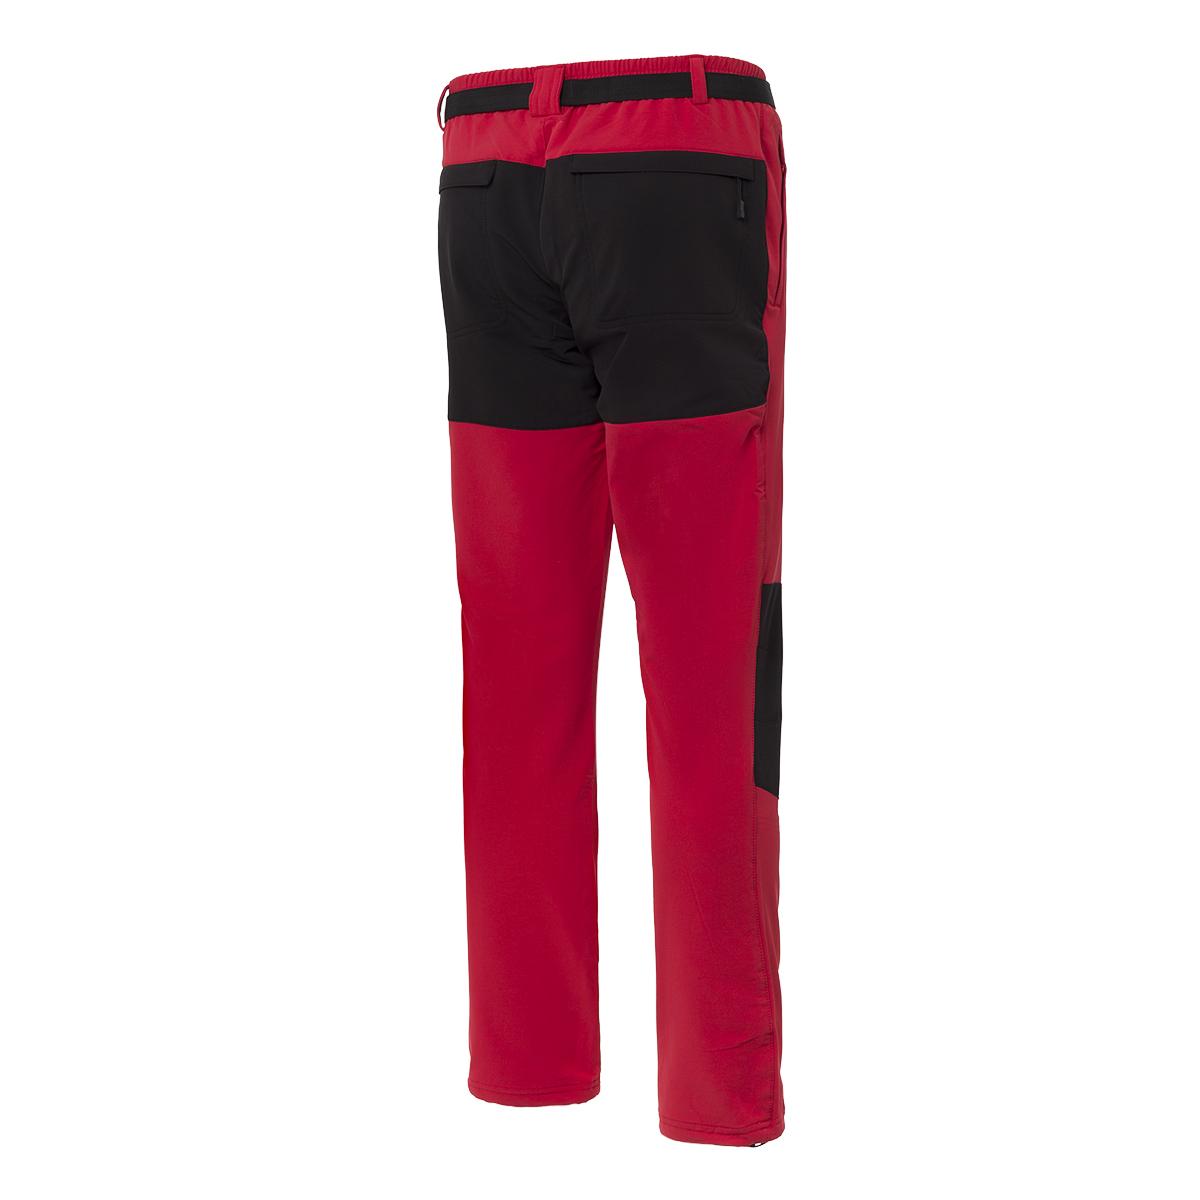 MAN'S VINSON STRETCH PANT RED